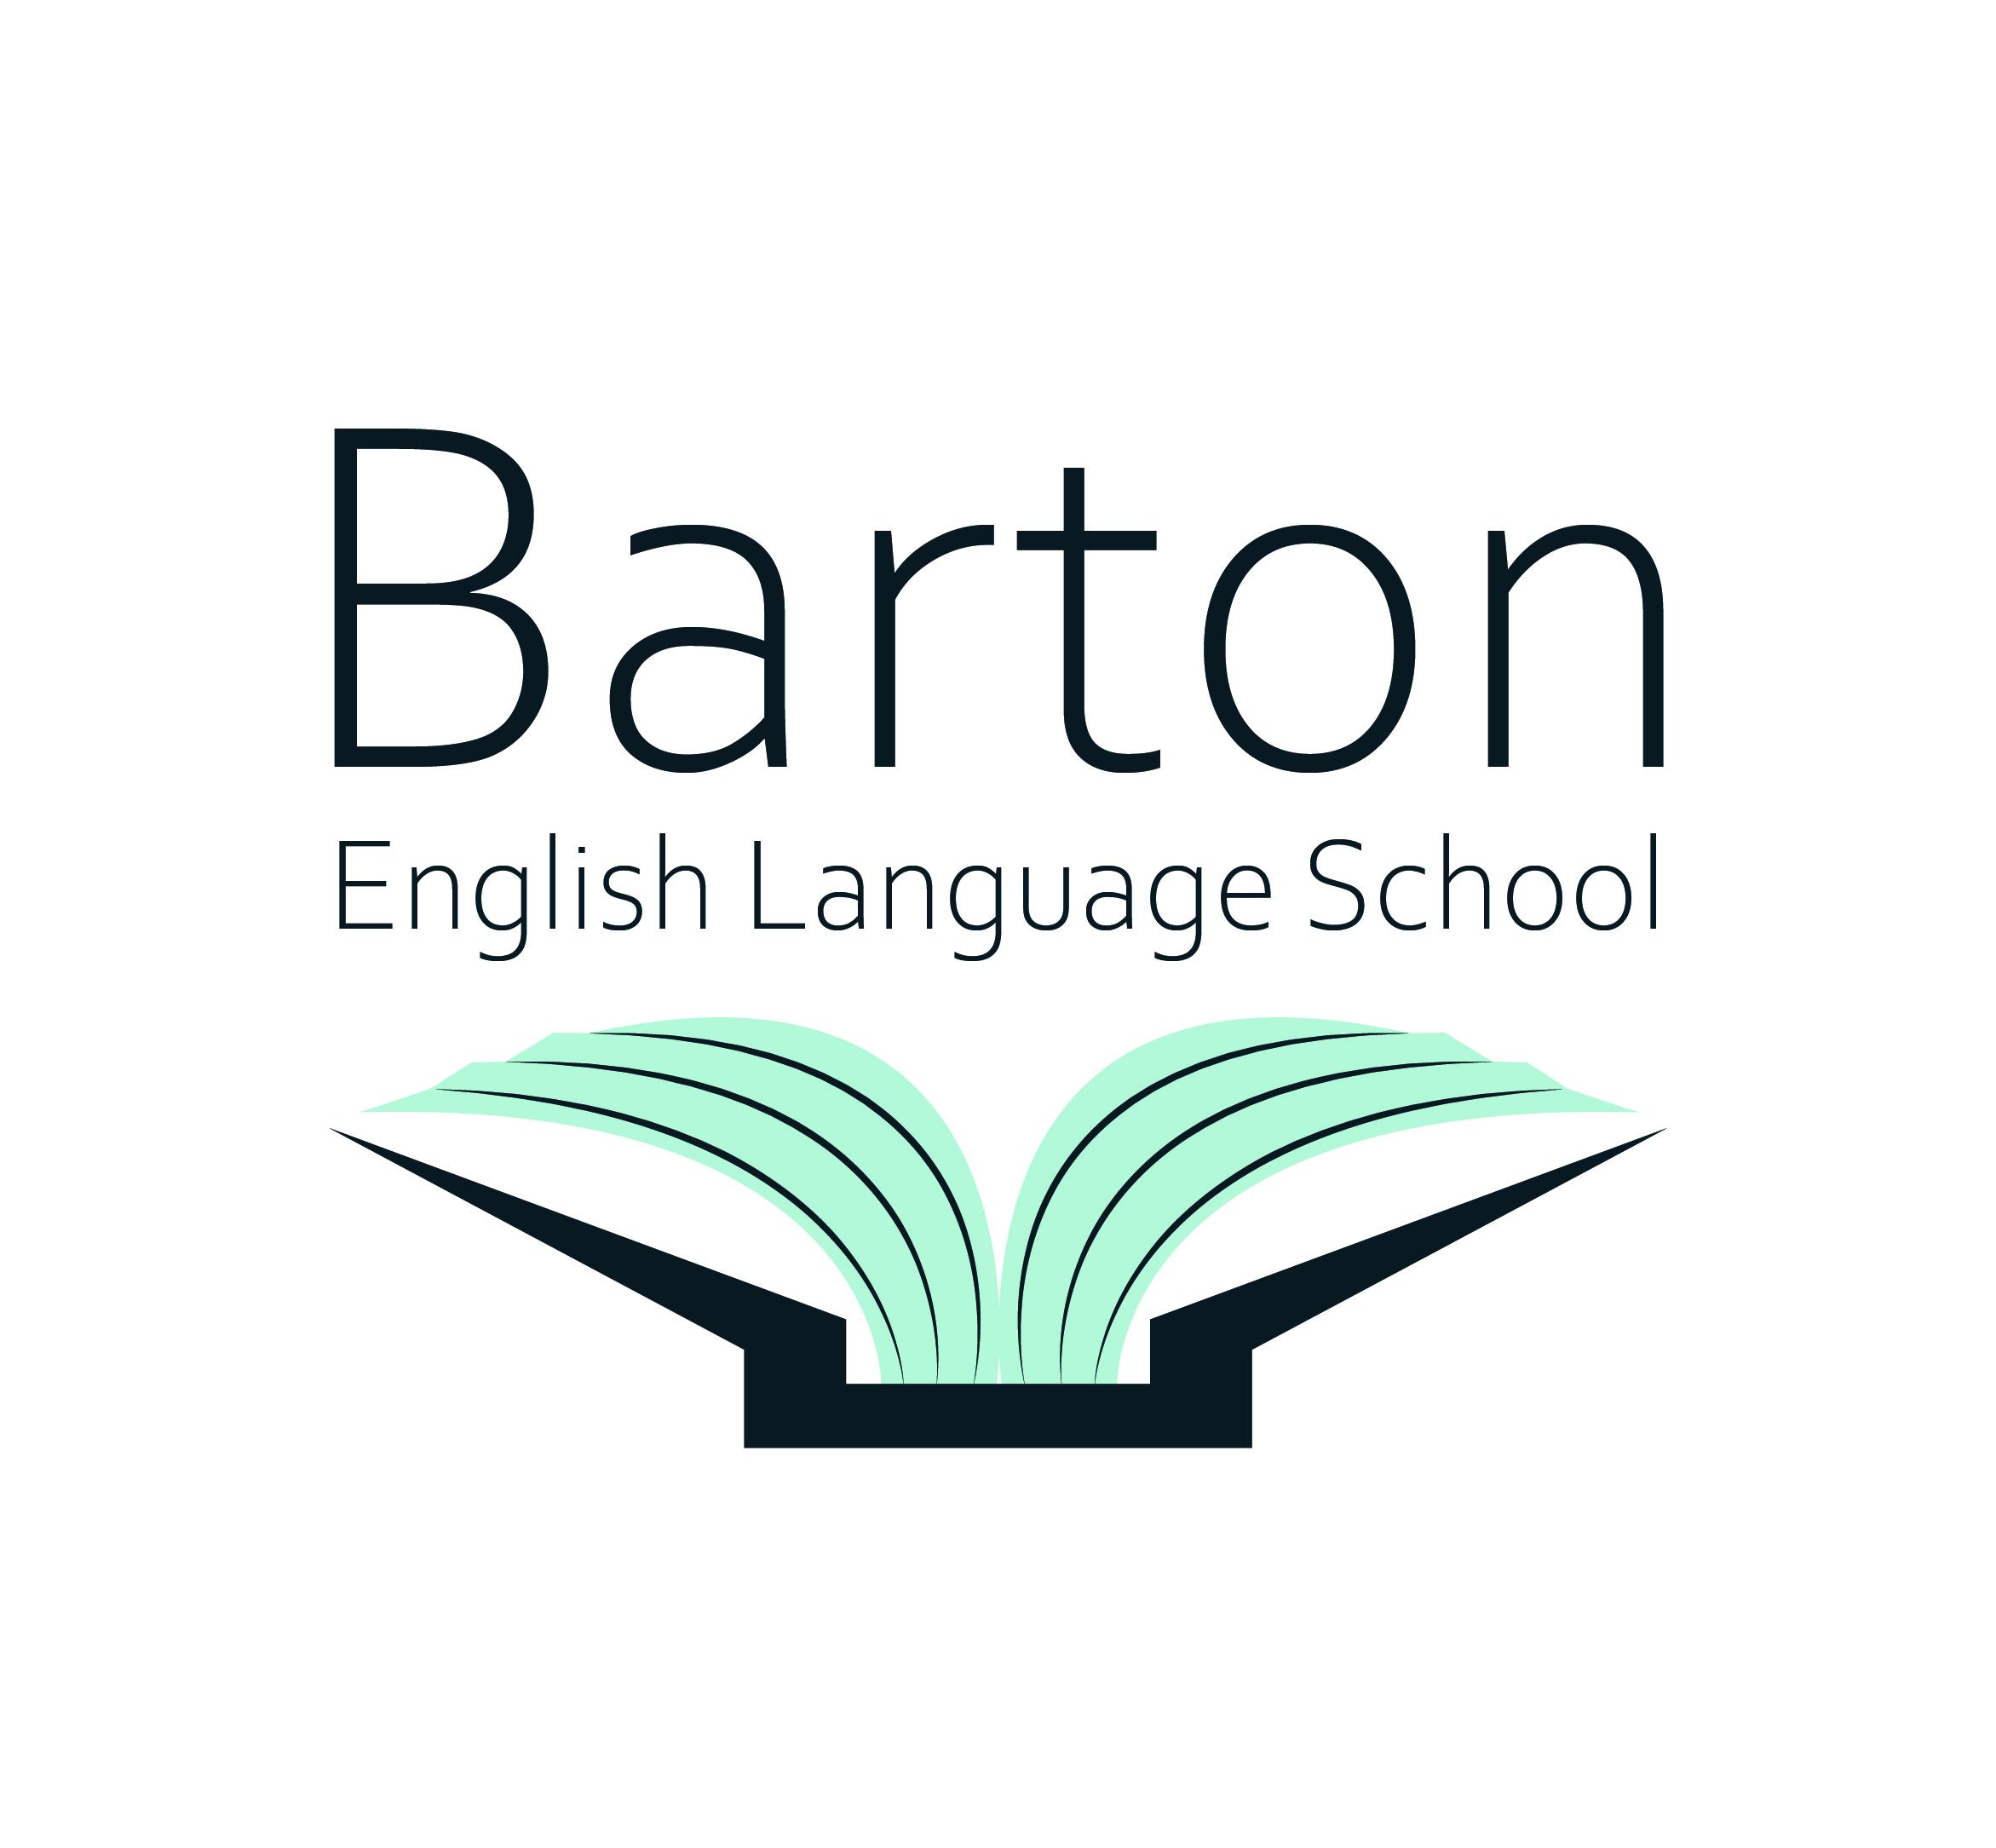 Barton English Language School final print-02.jpg